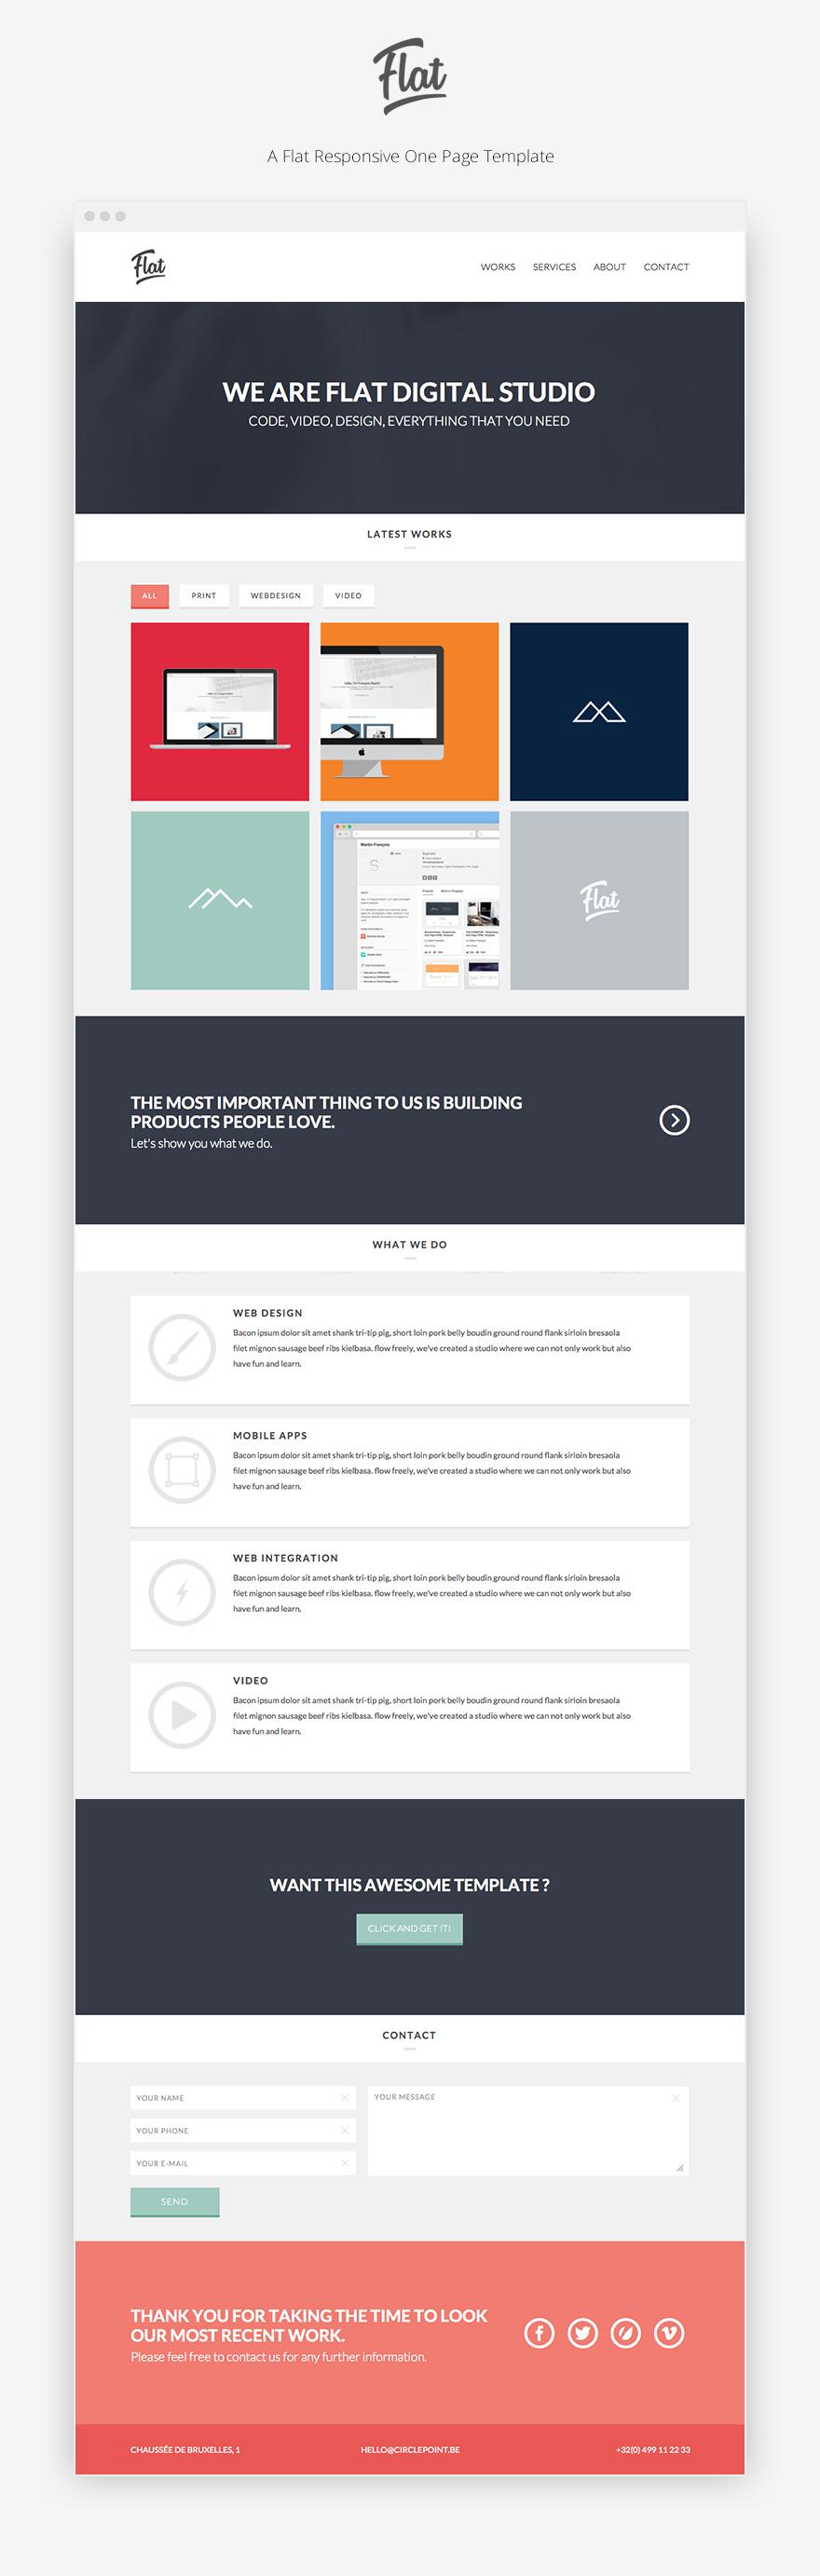 Flat Studio A Flat Responsive One Page Html Template Website Design Inspiration Web Design Css Templates